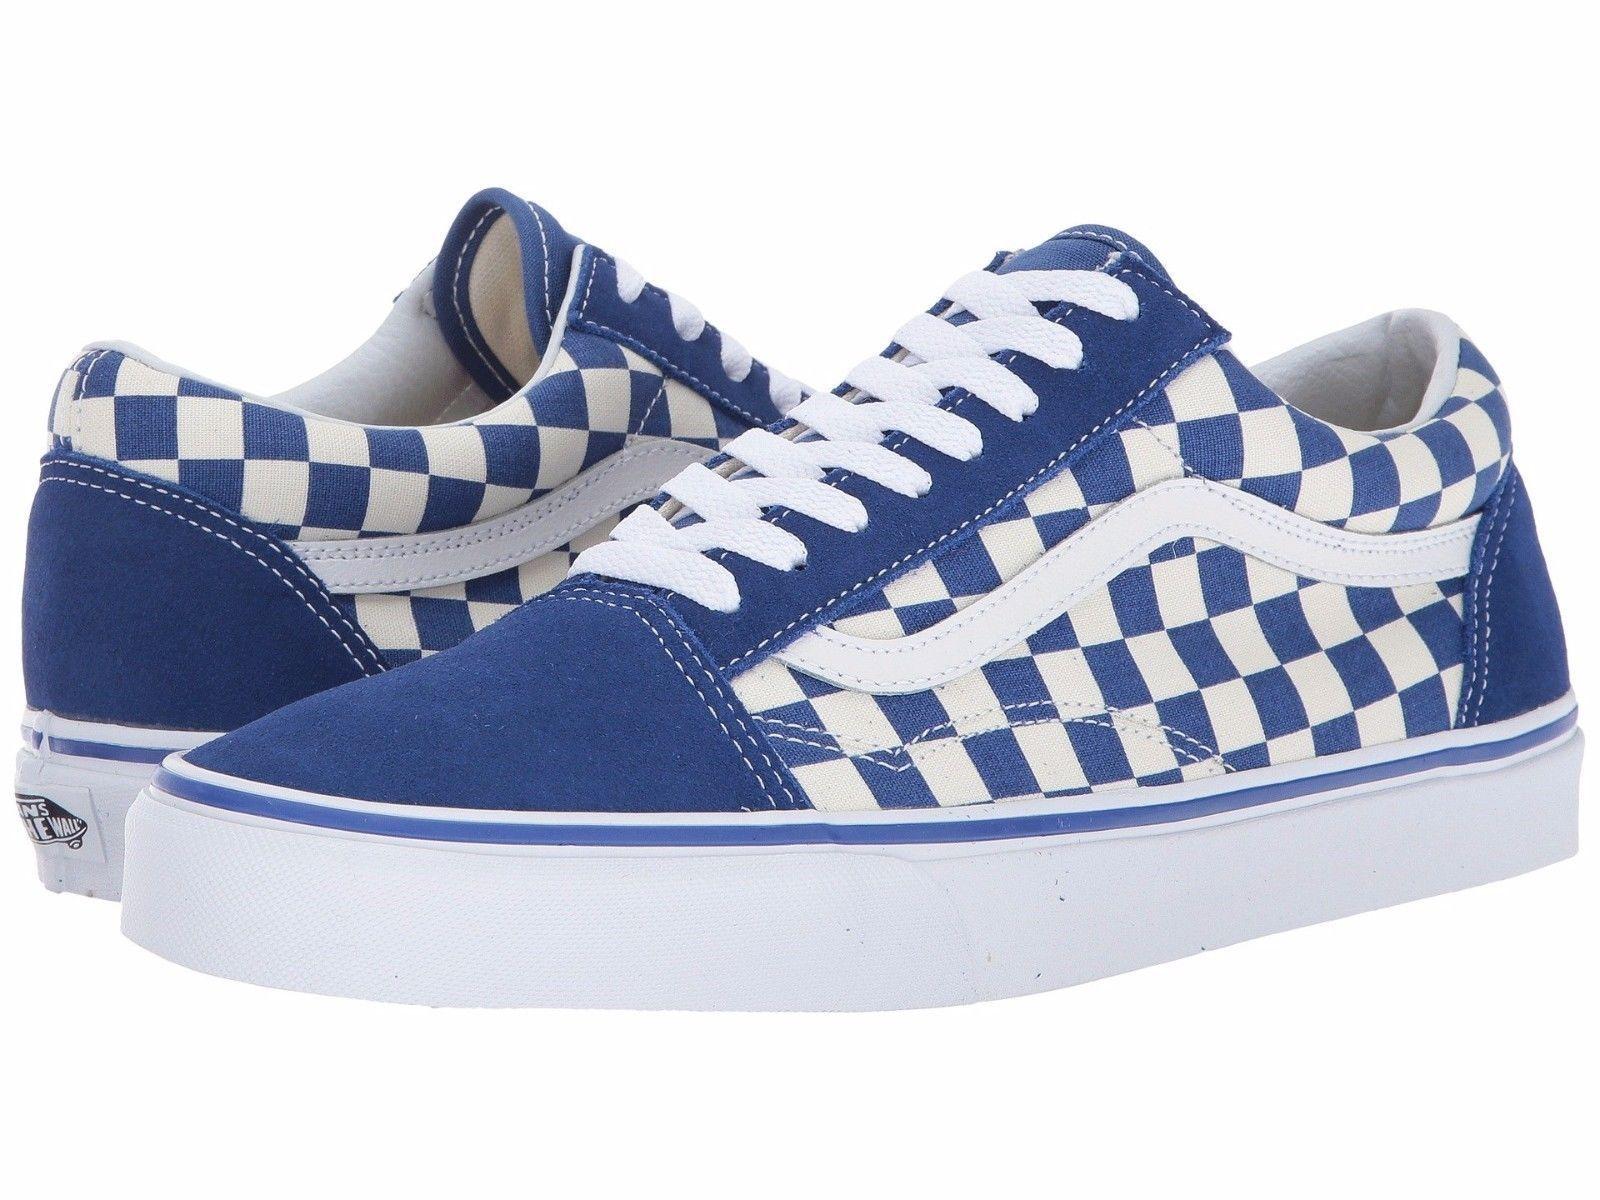 Vans shoes women, White leather shoes